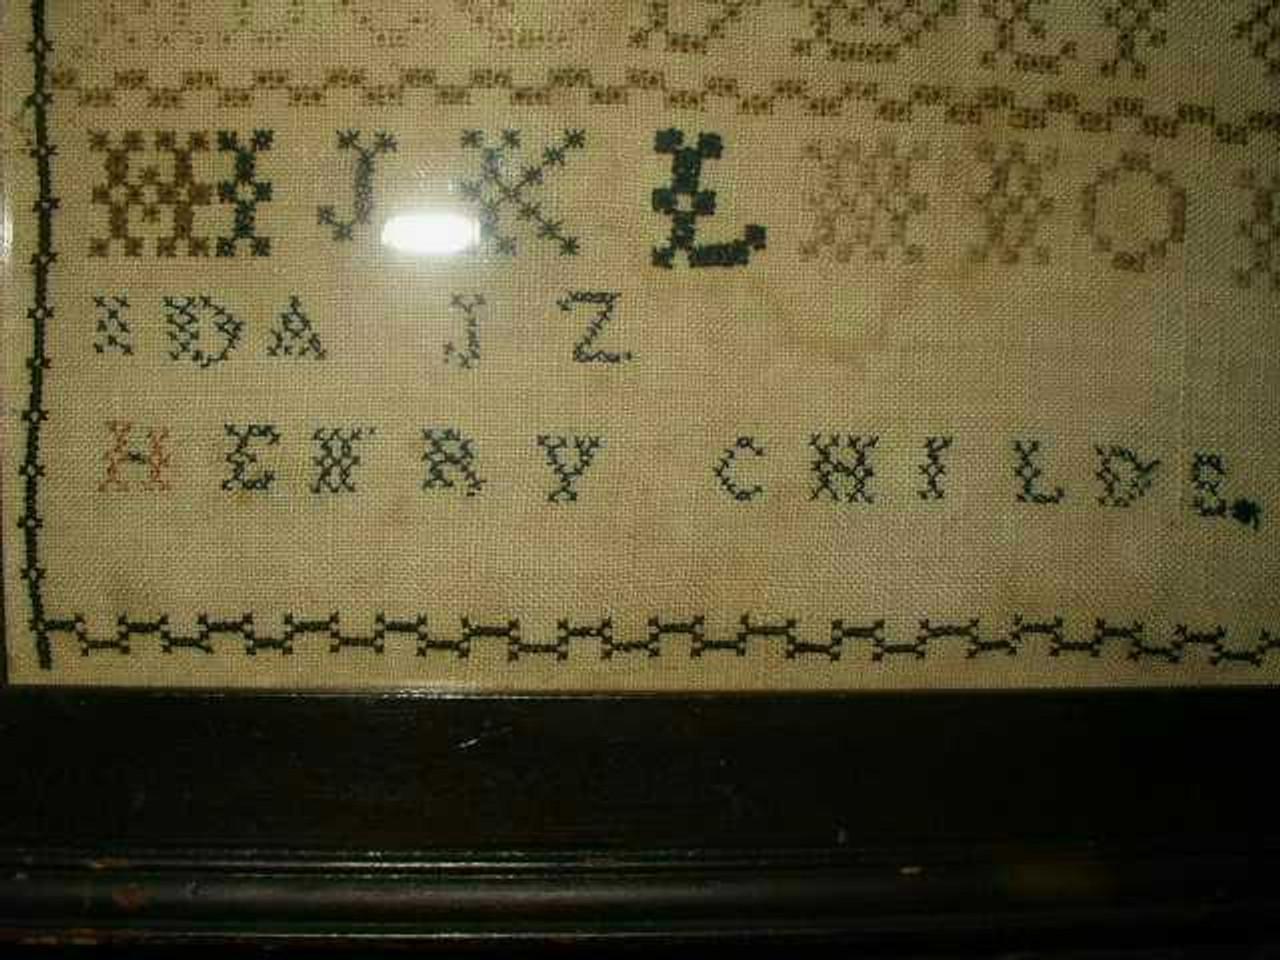 Early ABC School Girl Sampler On Homespun Original Frame